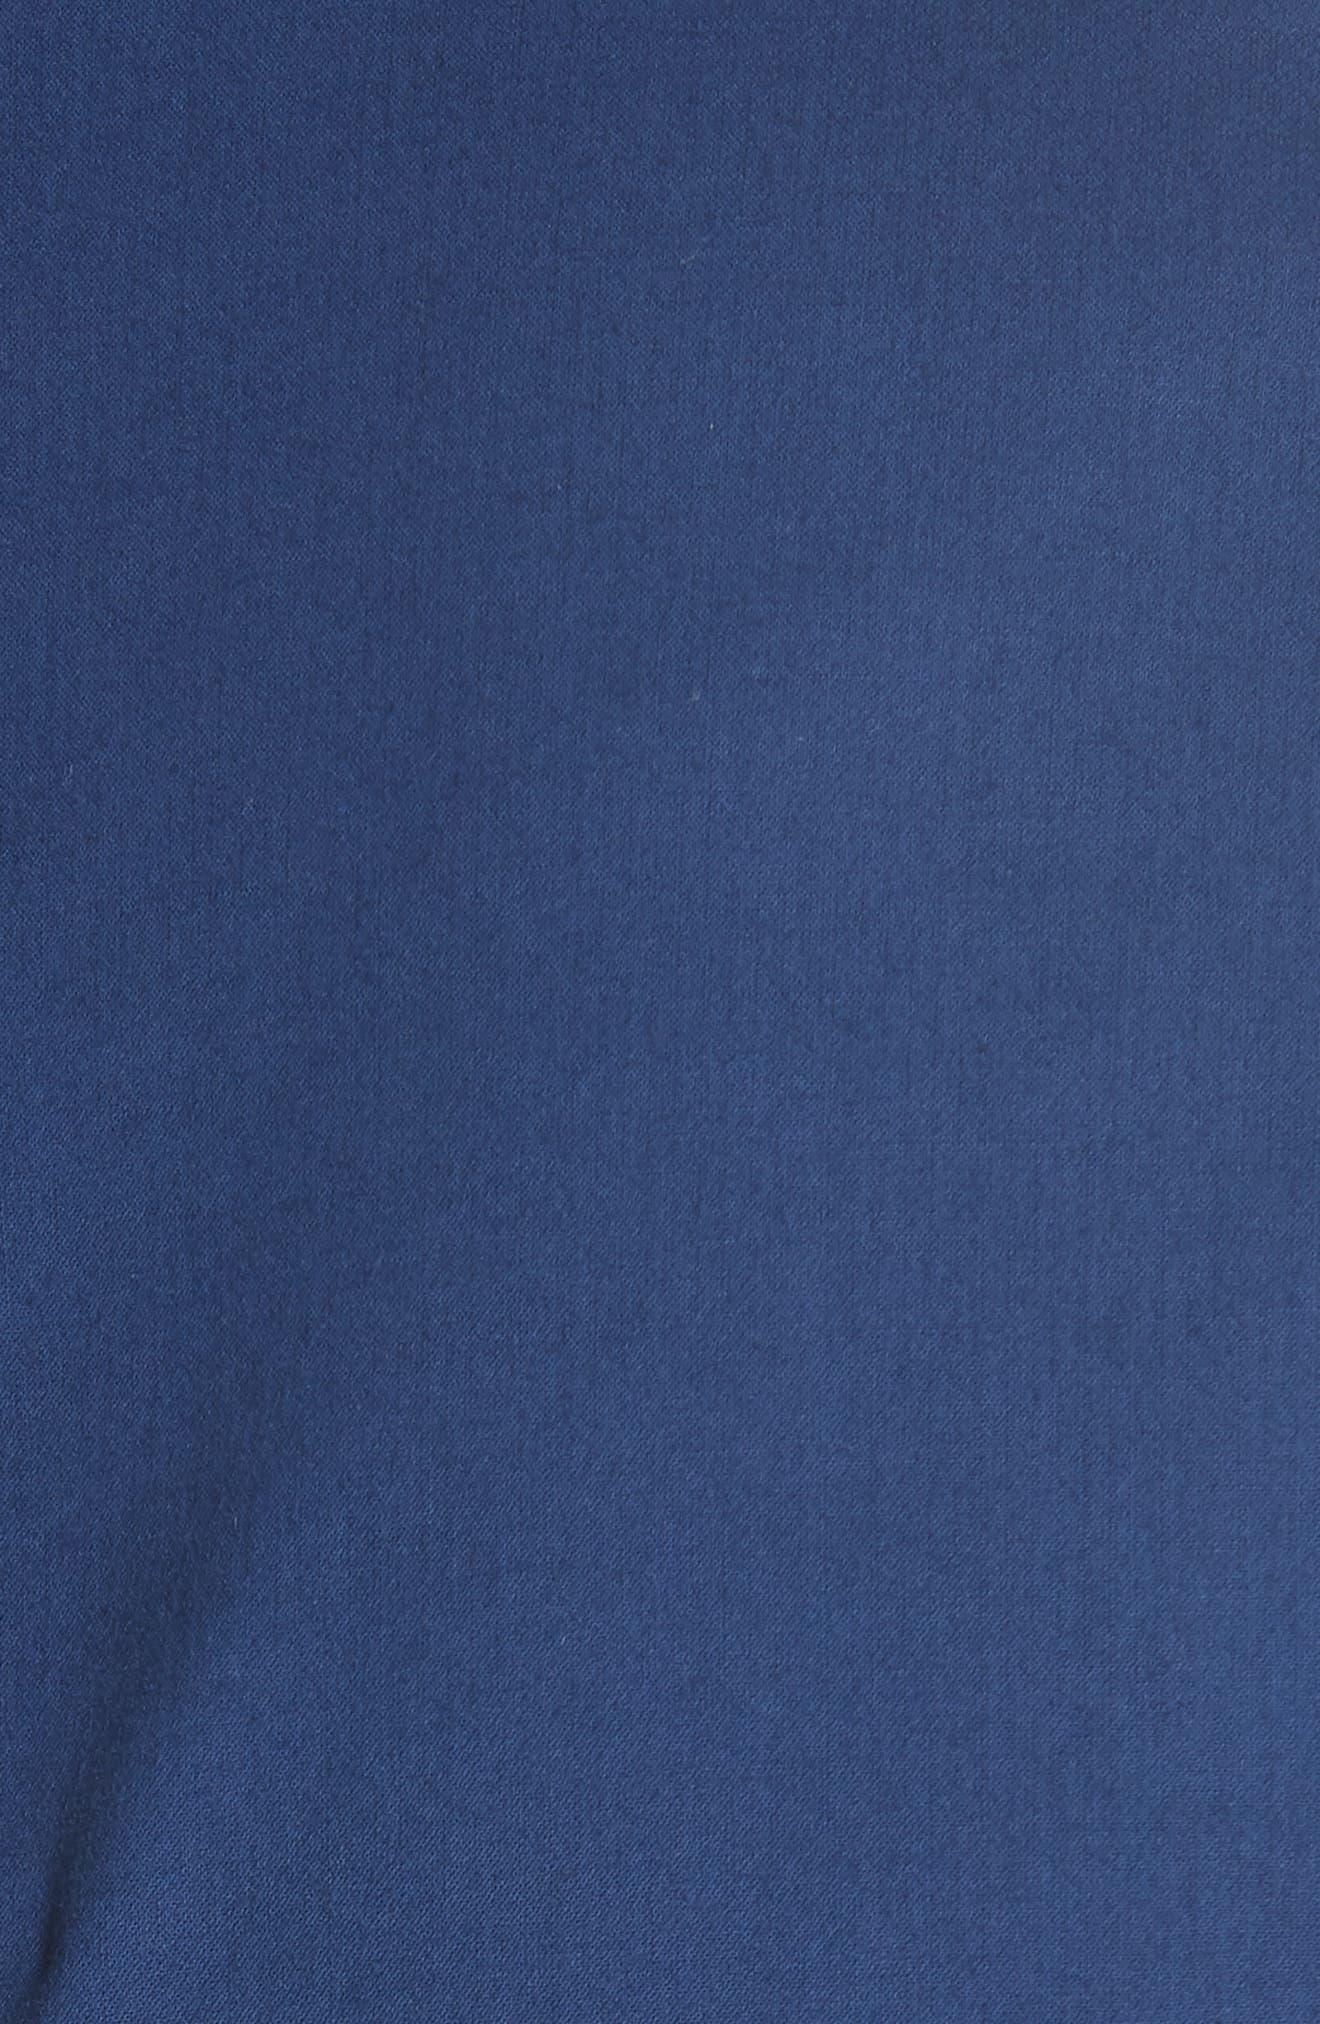 Lennox Belted Midi Dress,                             Alternate thumbnail 6, color,                             BLUE